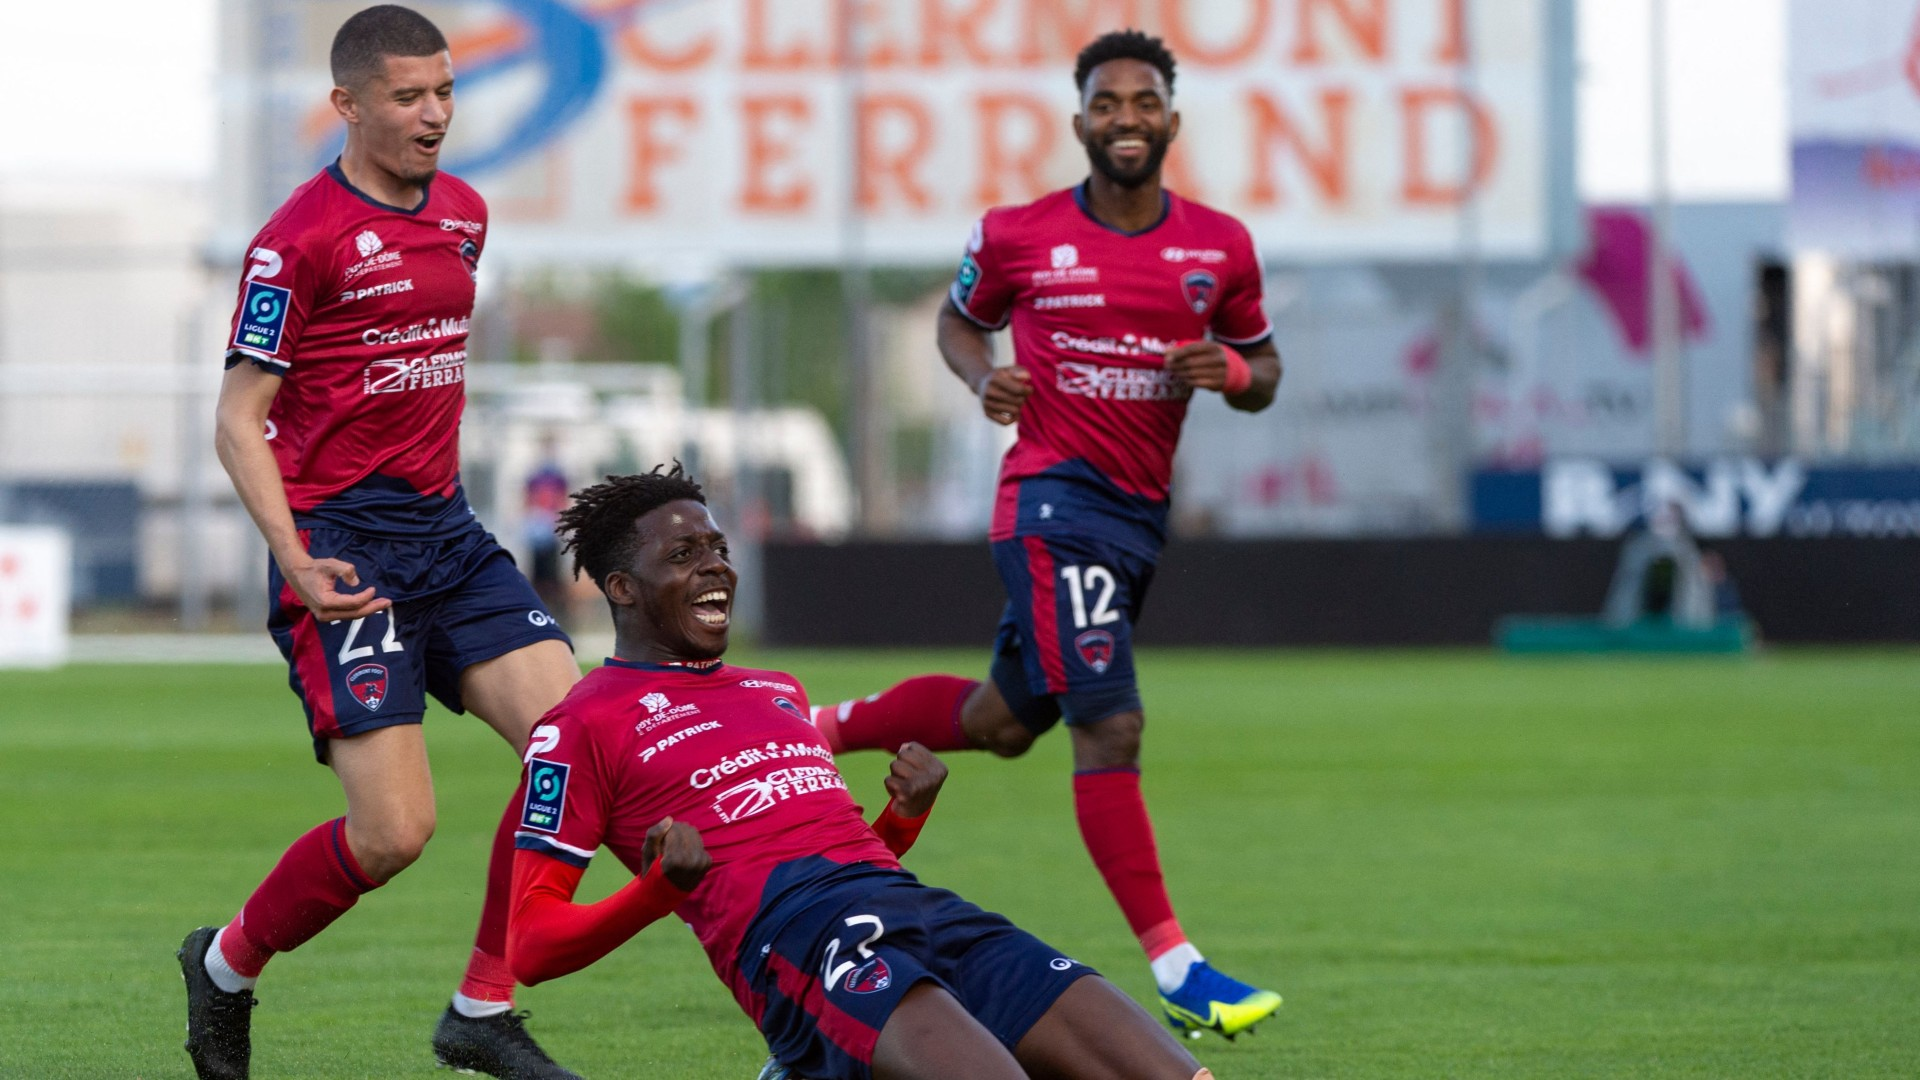 Ligue 1 Wrap: Bahoken, Khazri & Dossou score as Kouyate sees red